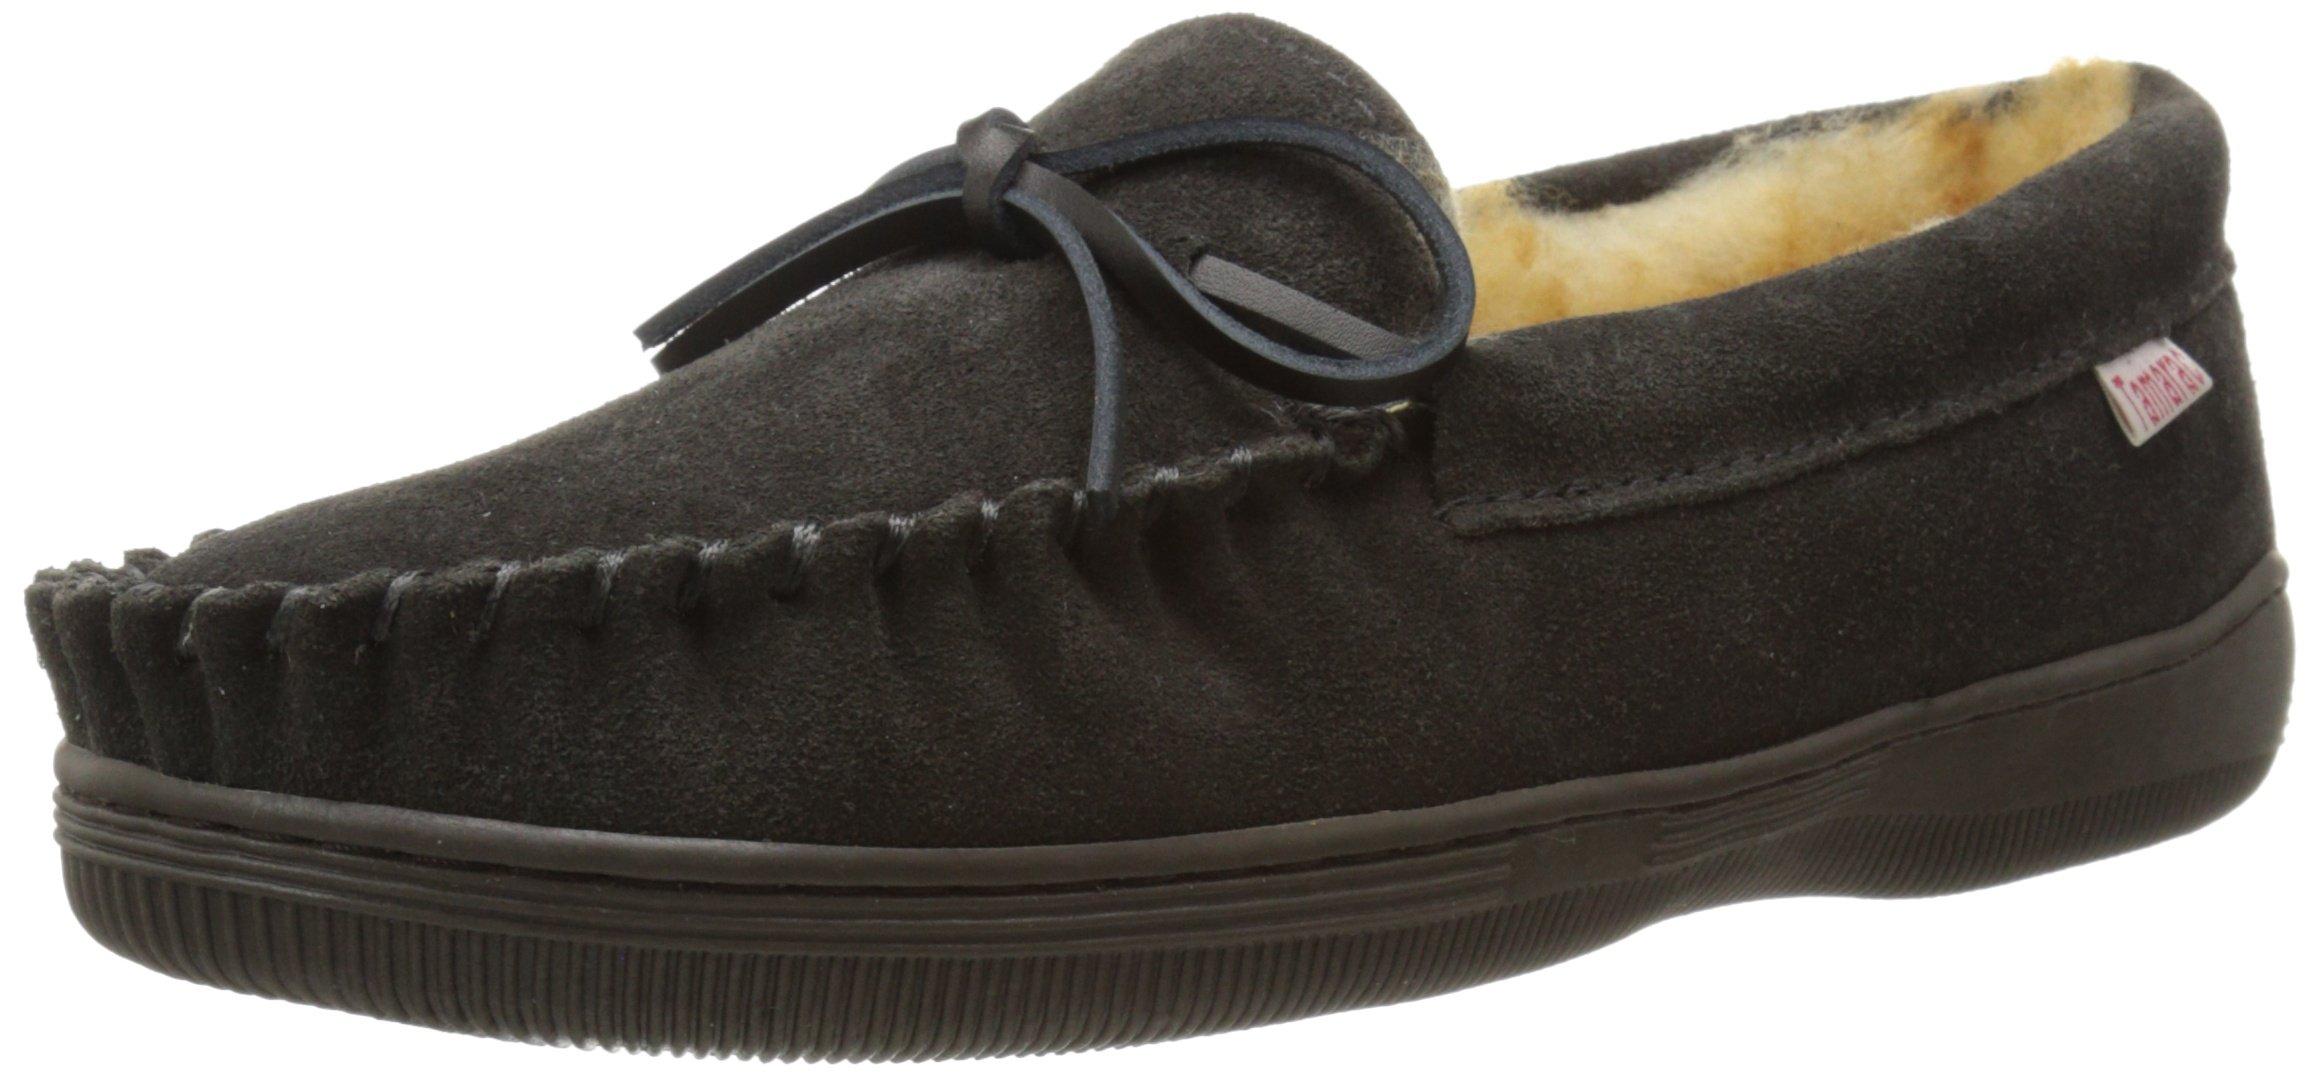 Tamarac by Slippers International Men's Camper Slip-On Loafer, Charcoal Grey, 10 M US